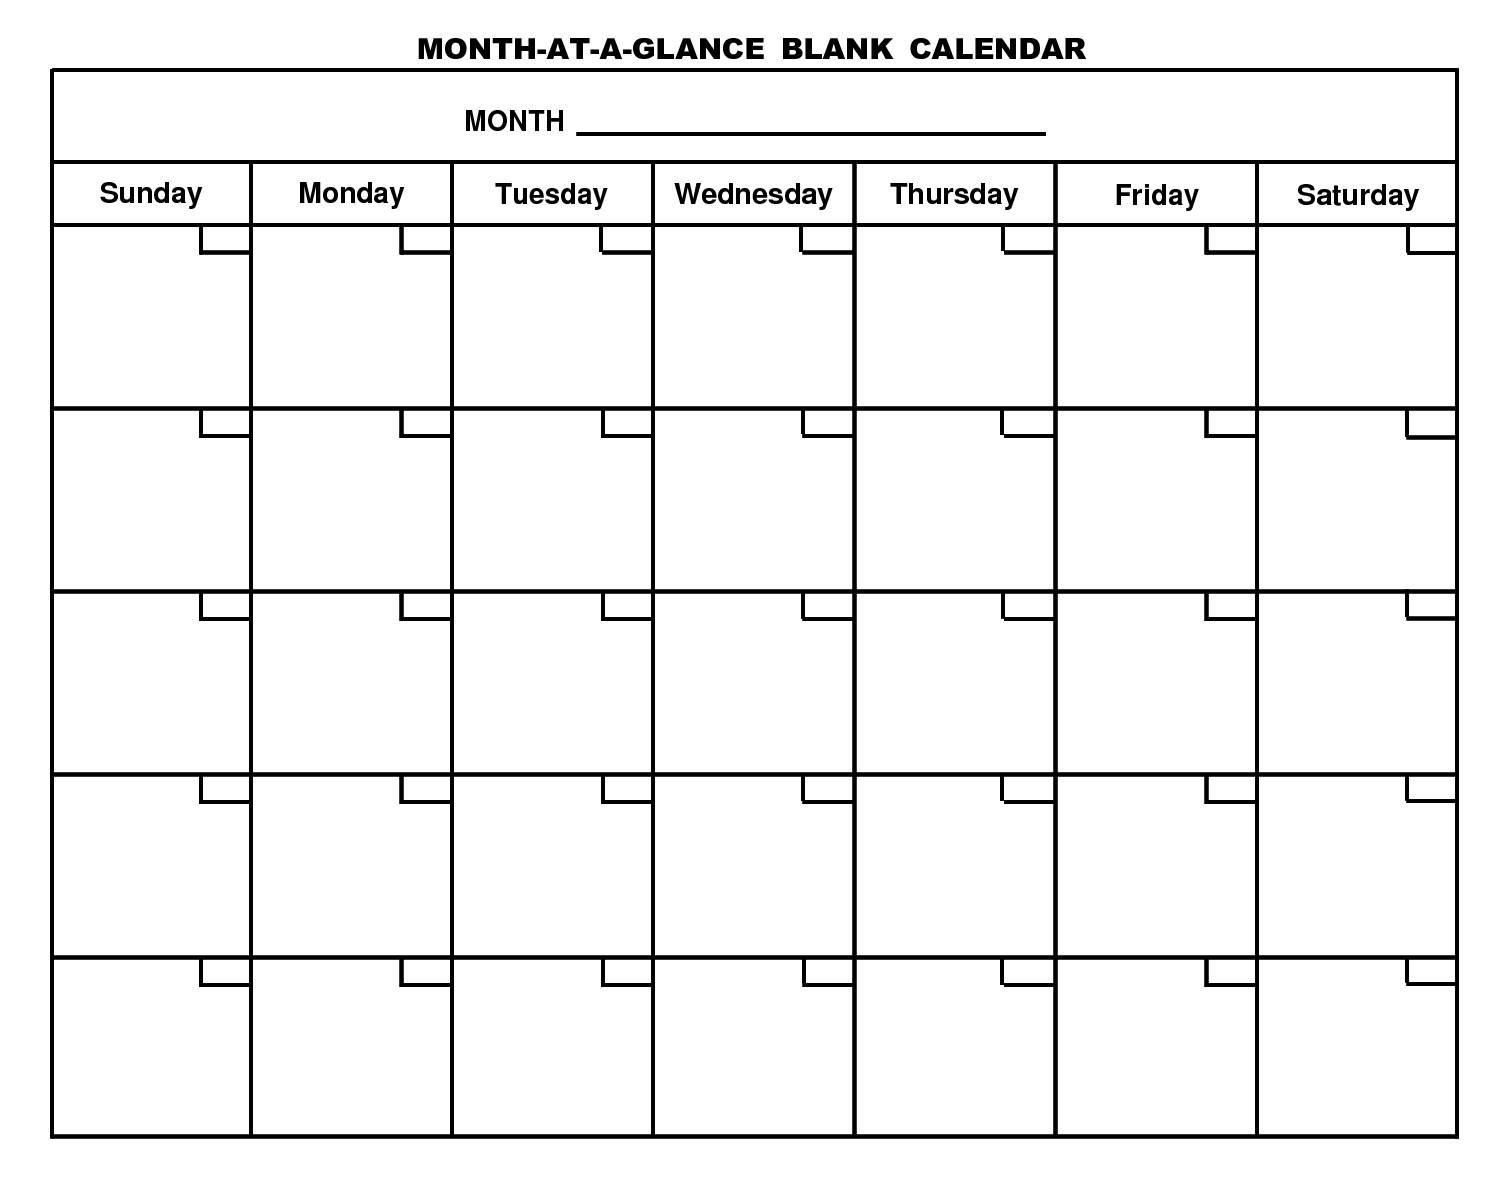 Blank Calendar Monthly - Yeniscale.co  Blank 3 Month Printable Monthly Calendar